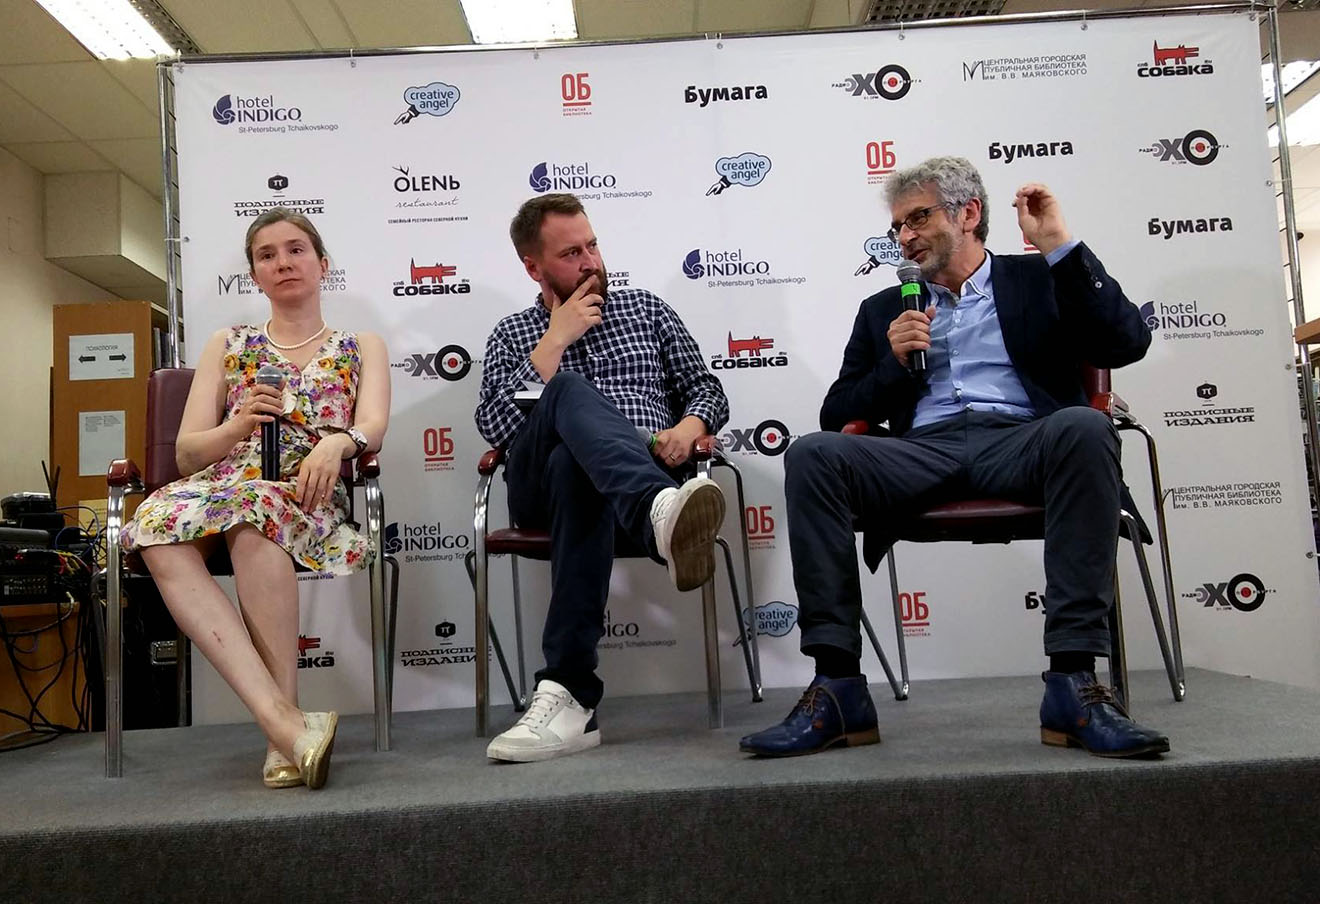 Екатерина Шульман, Николай Солодников и Александр Эткинд.